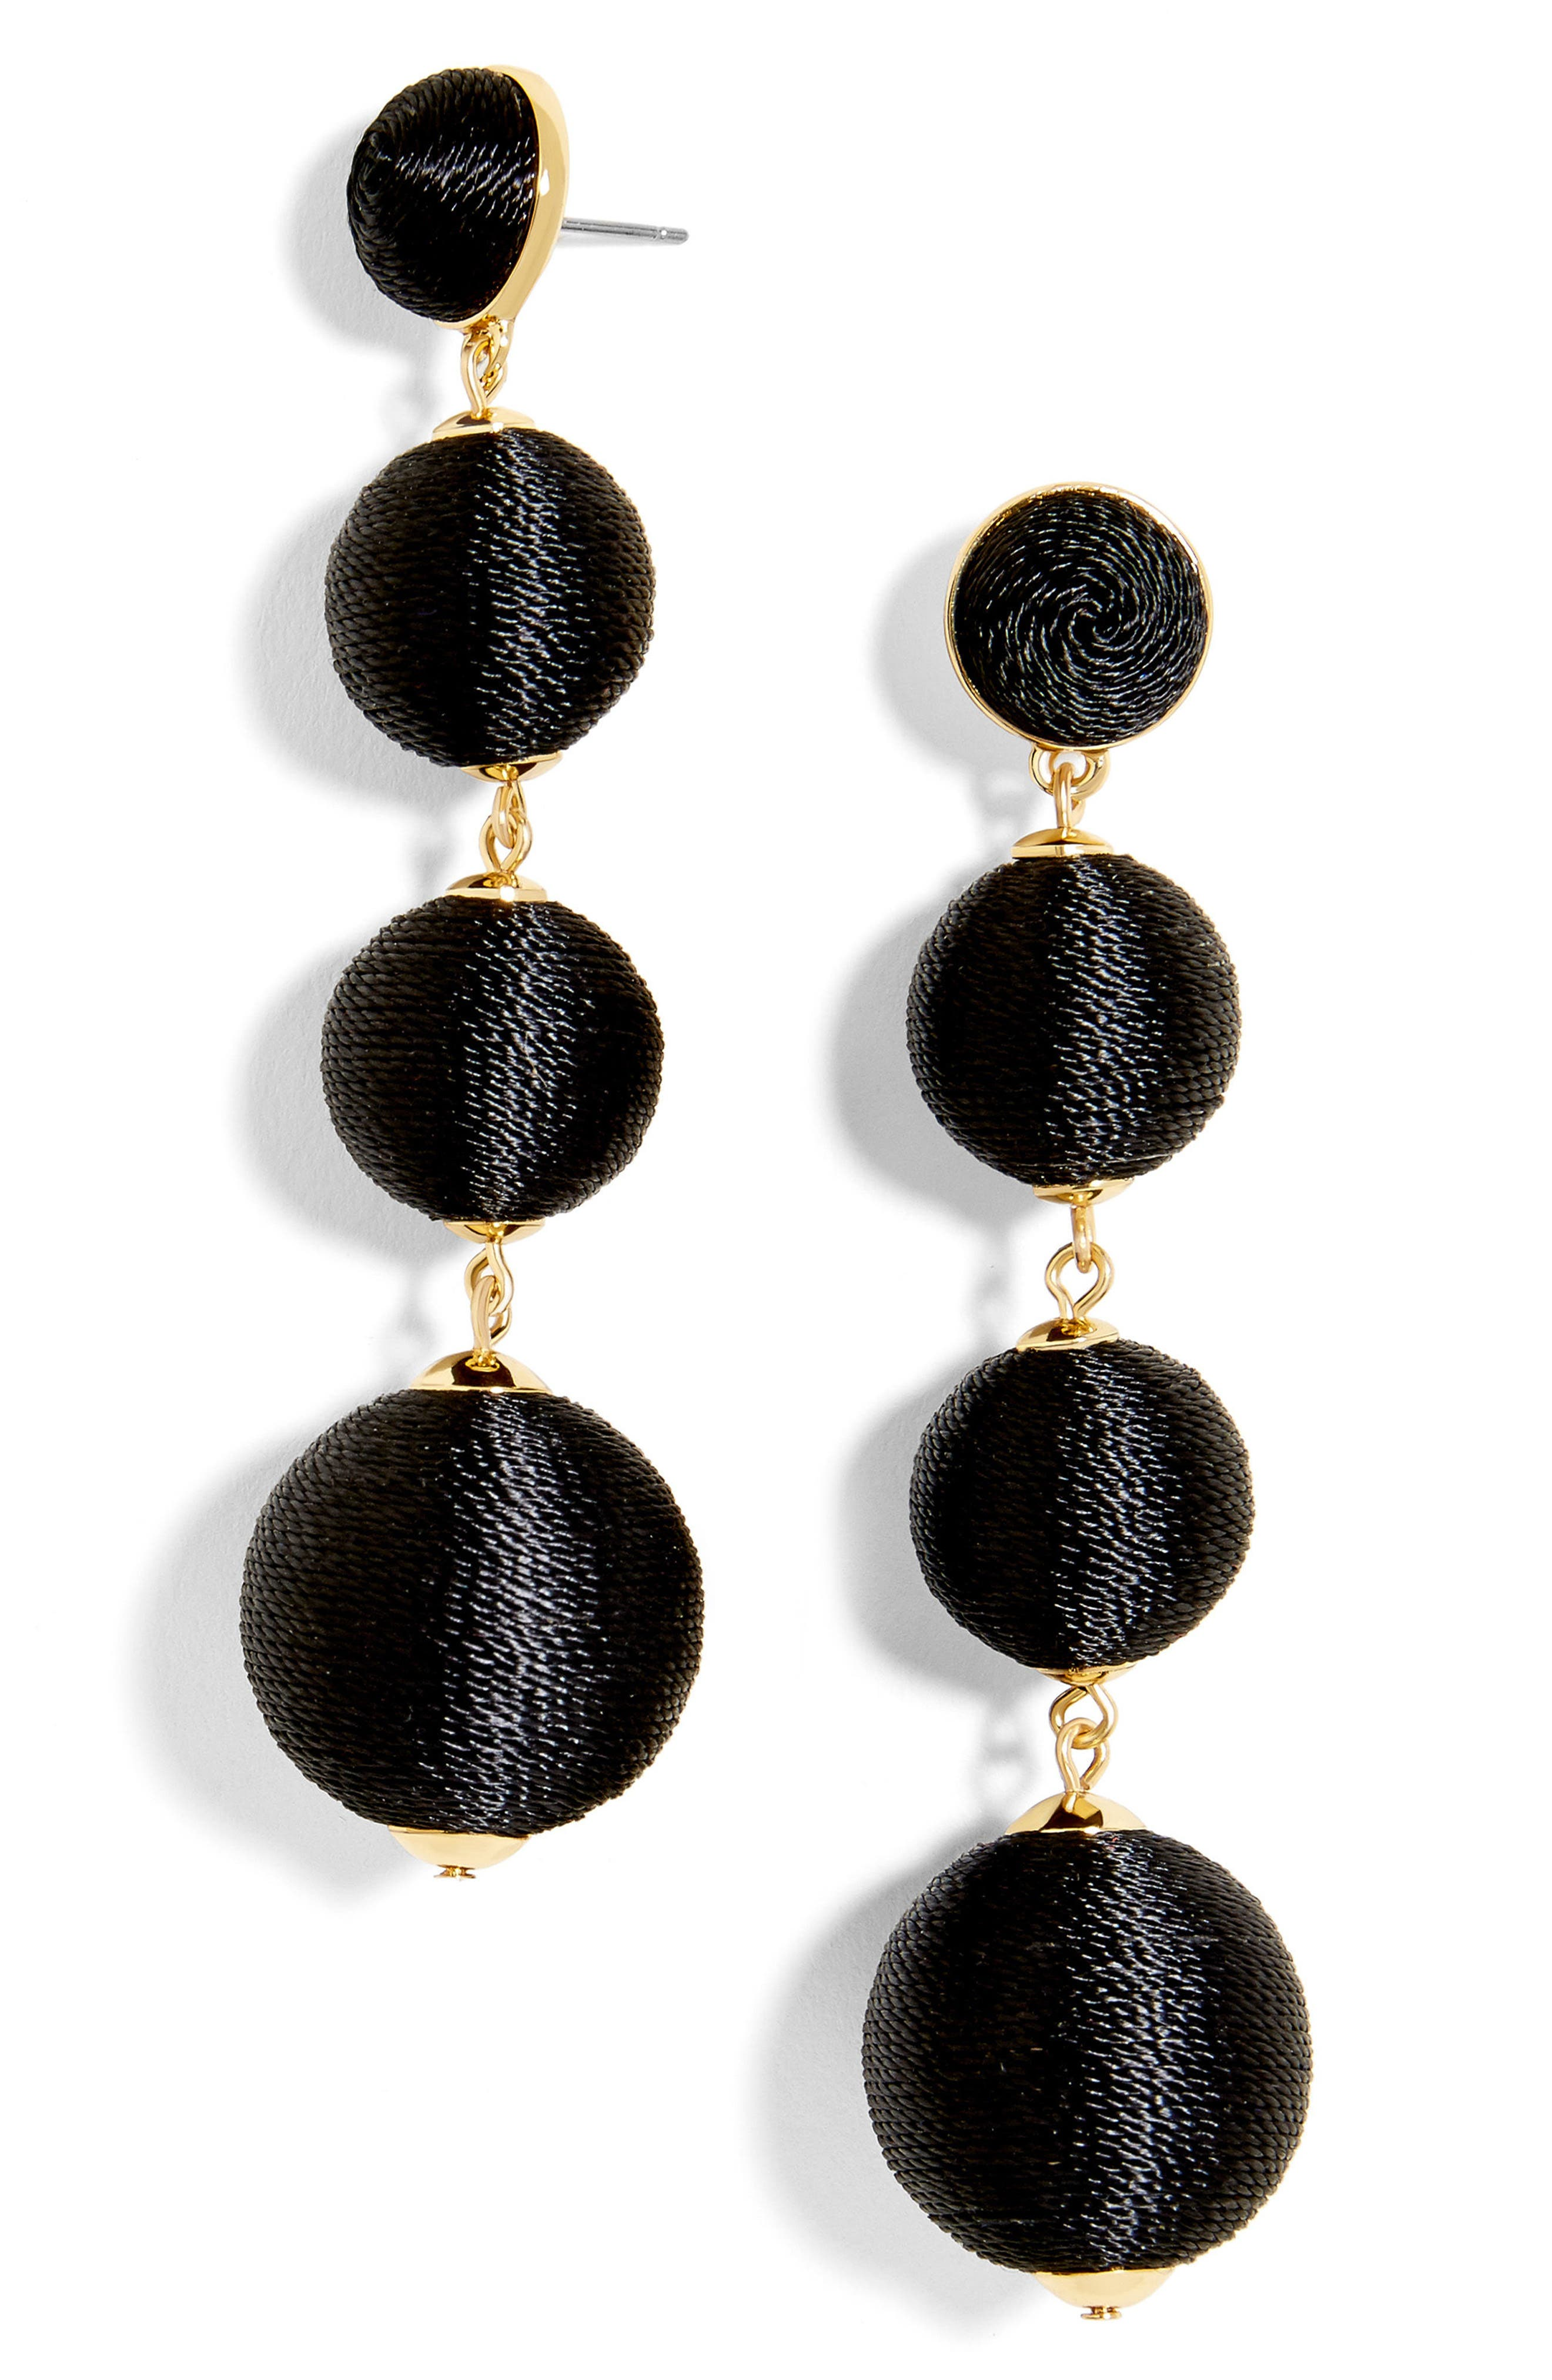 Criselda Ball Shoulder Duster Earrings,                         Main,                         color, Black